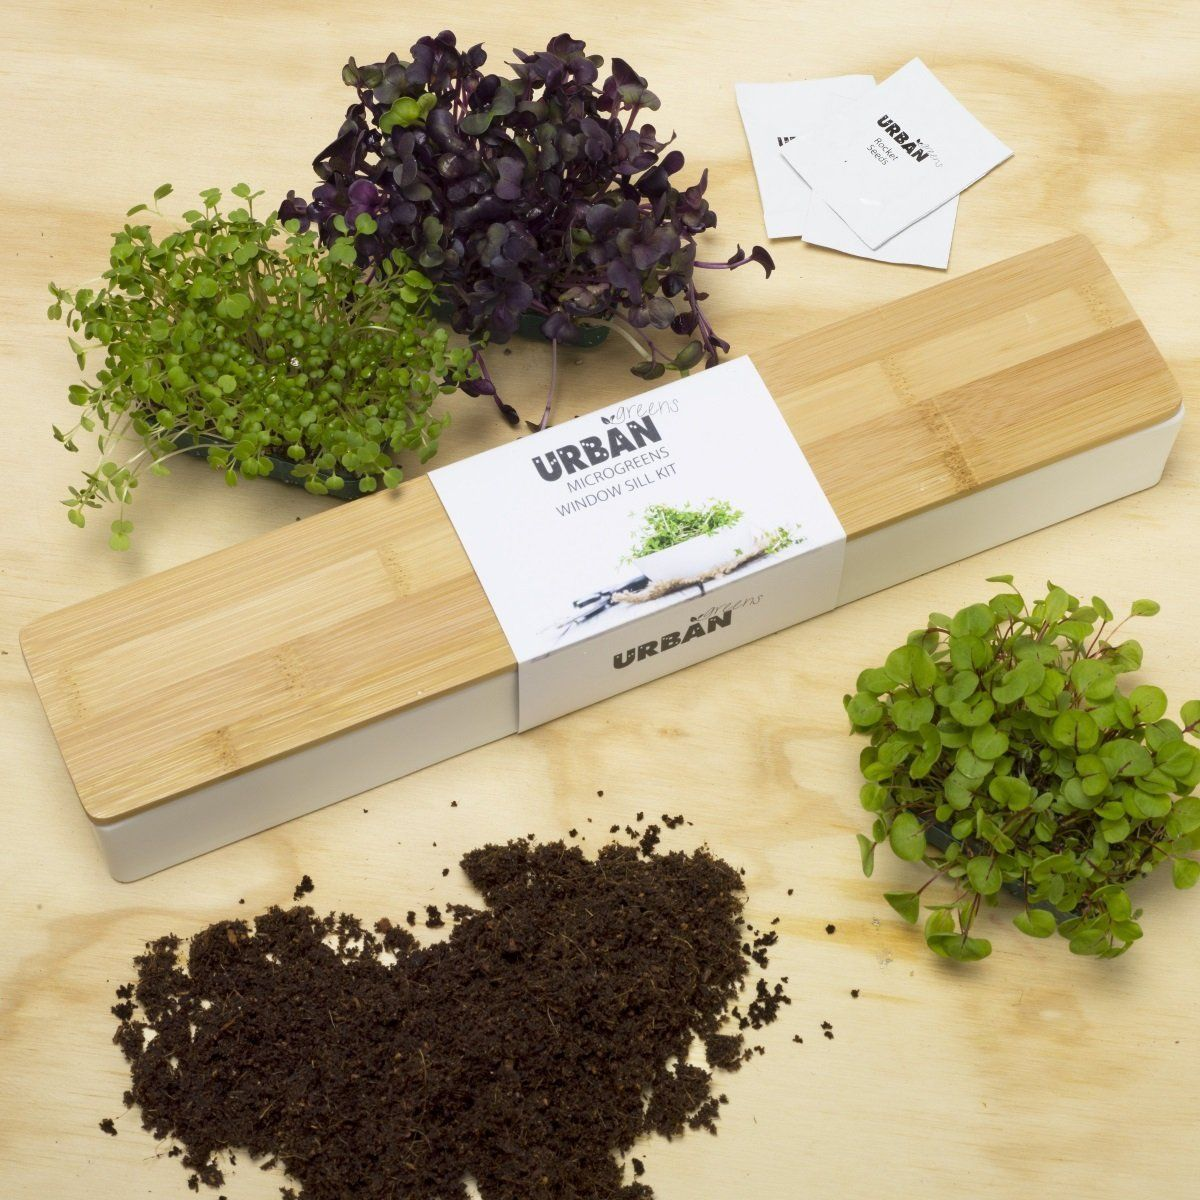 Urban Greens Microgreens Windowsill Grow Kit in 2020